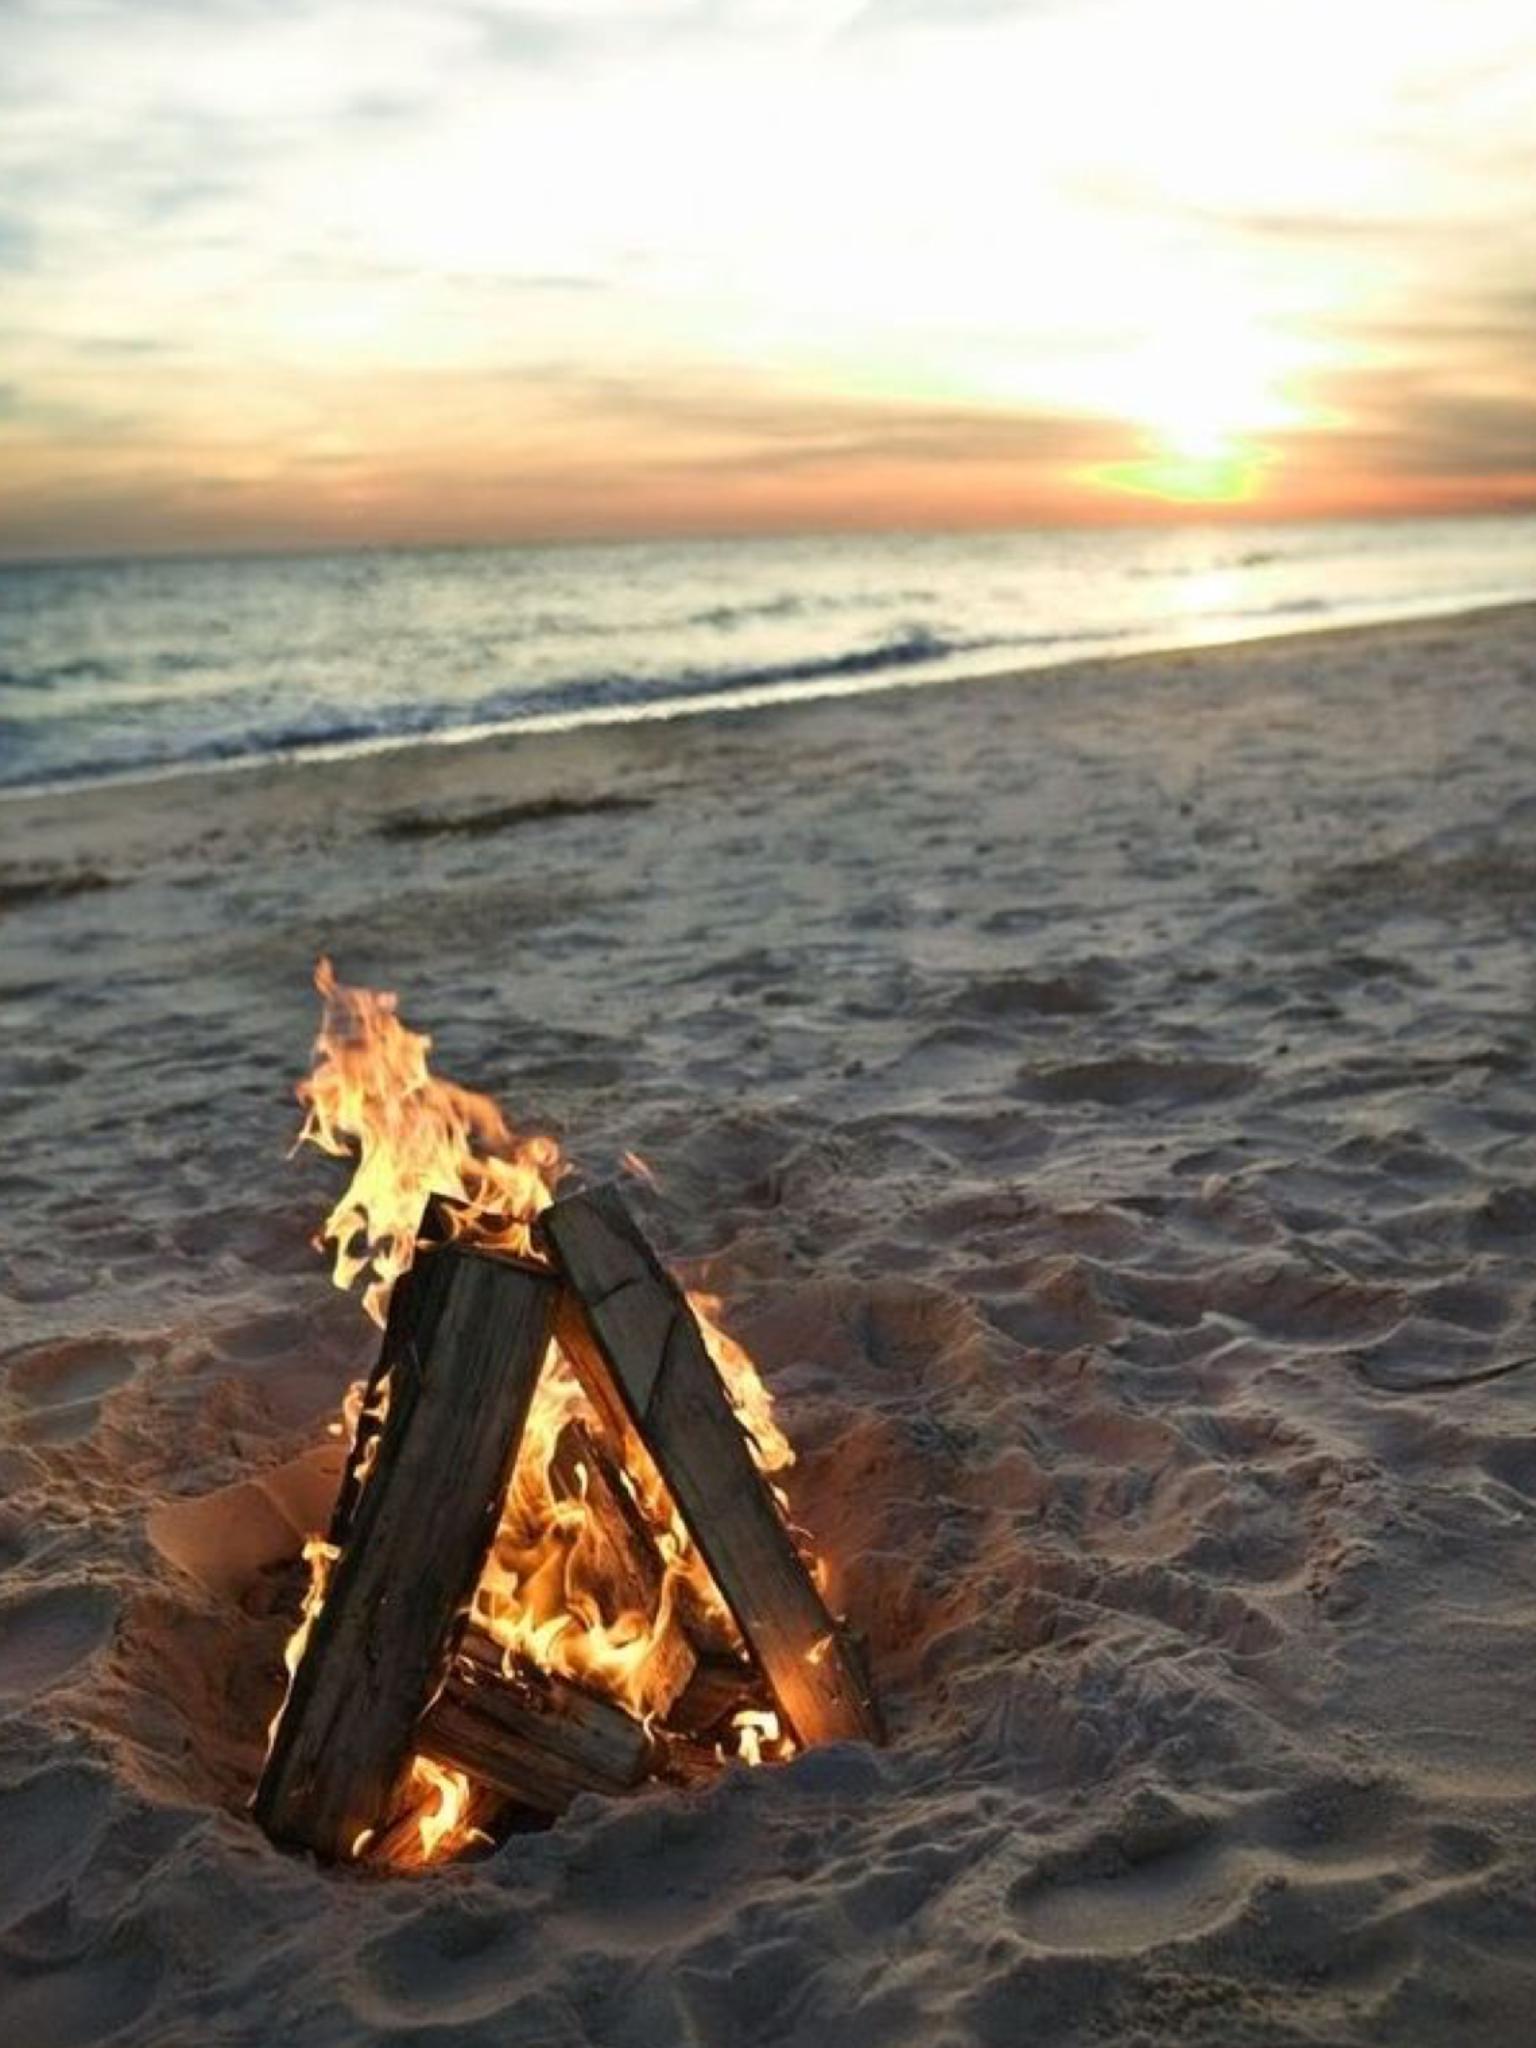 Pin by Jan on warm days | Beach fire, Beach, Beach bonfire